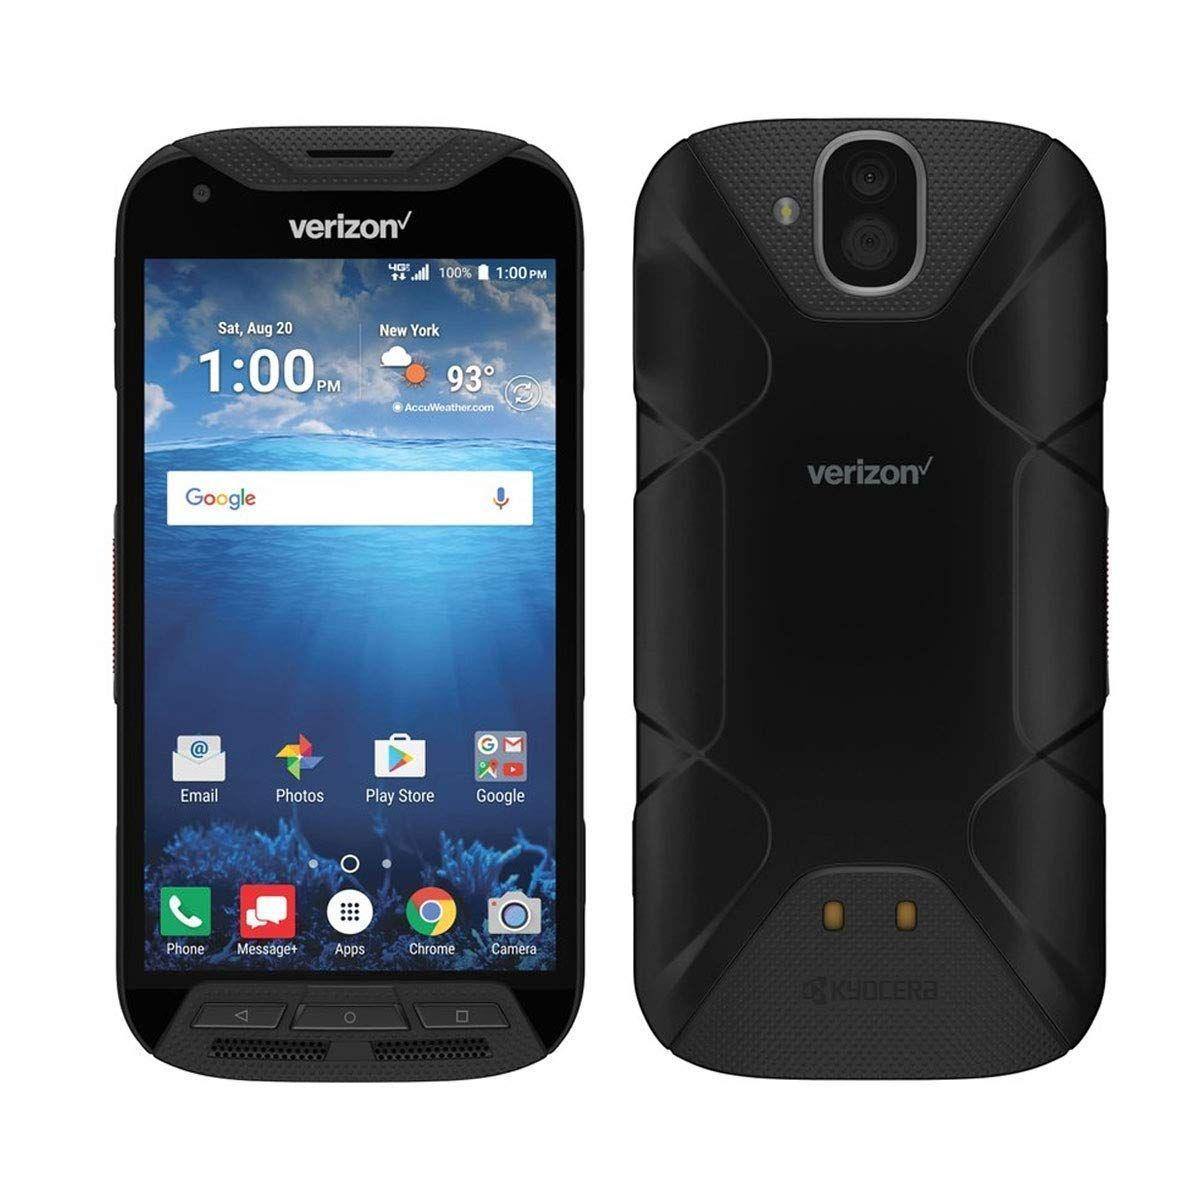 Kyocera DuraFORCE E6810 Pro with Sapphire Shield Verizon